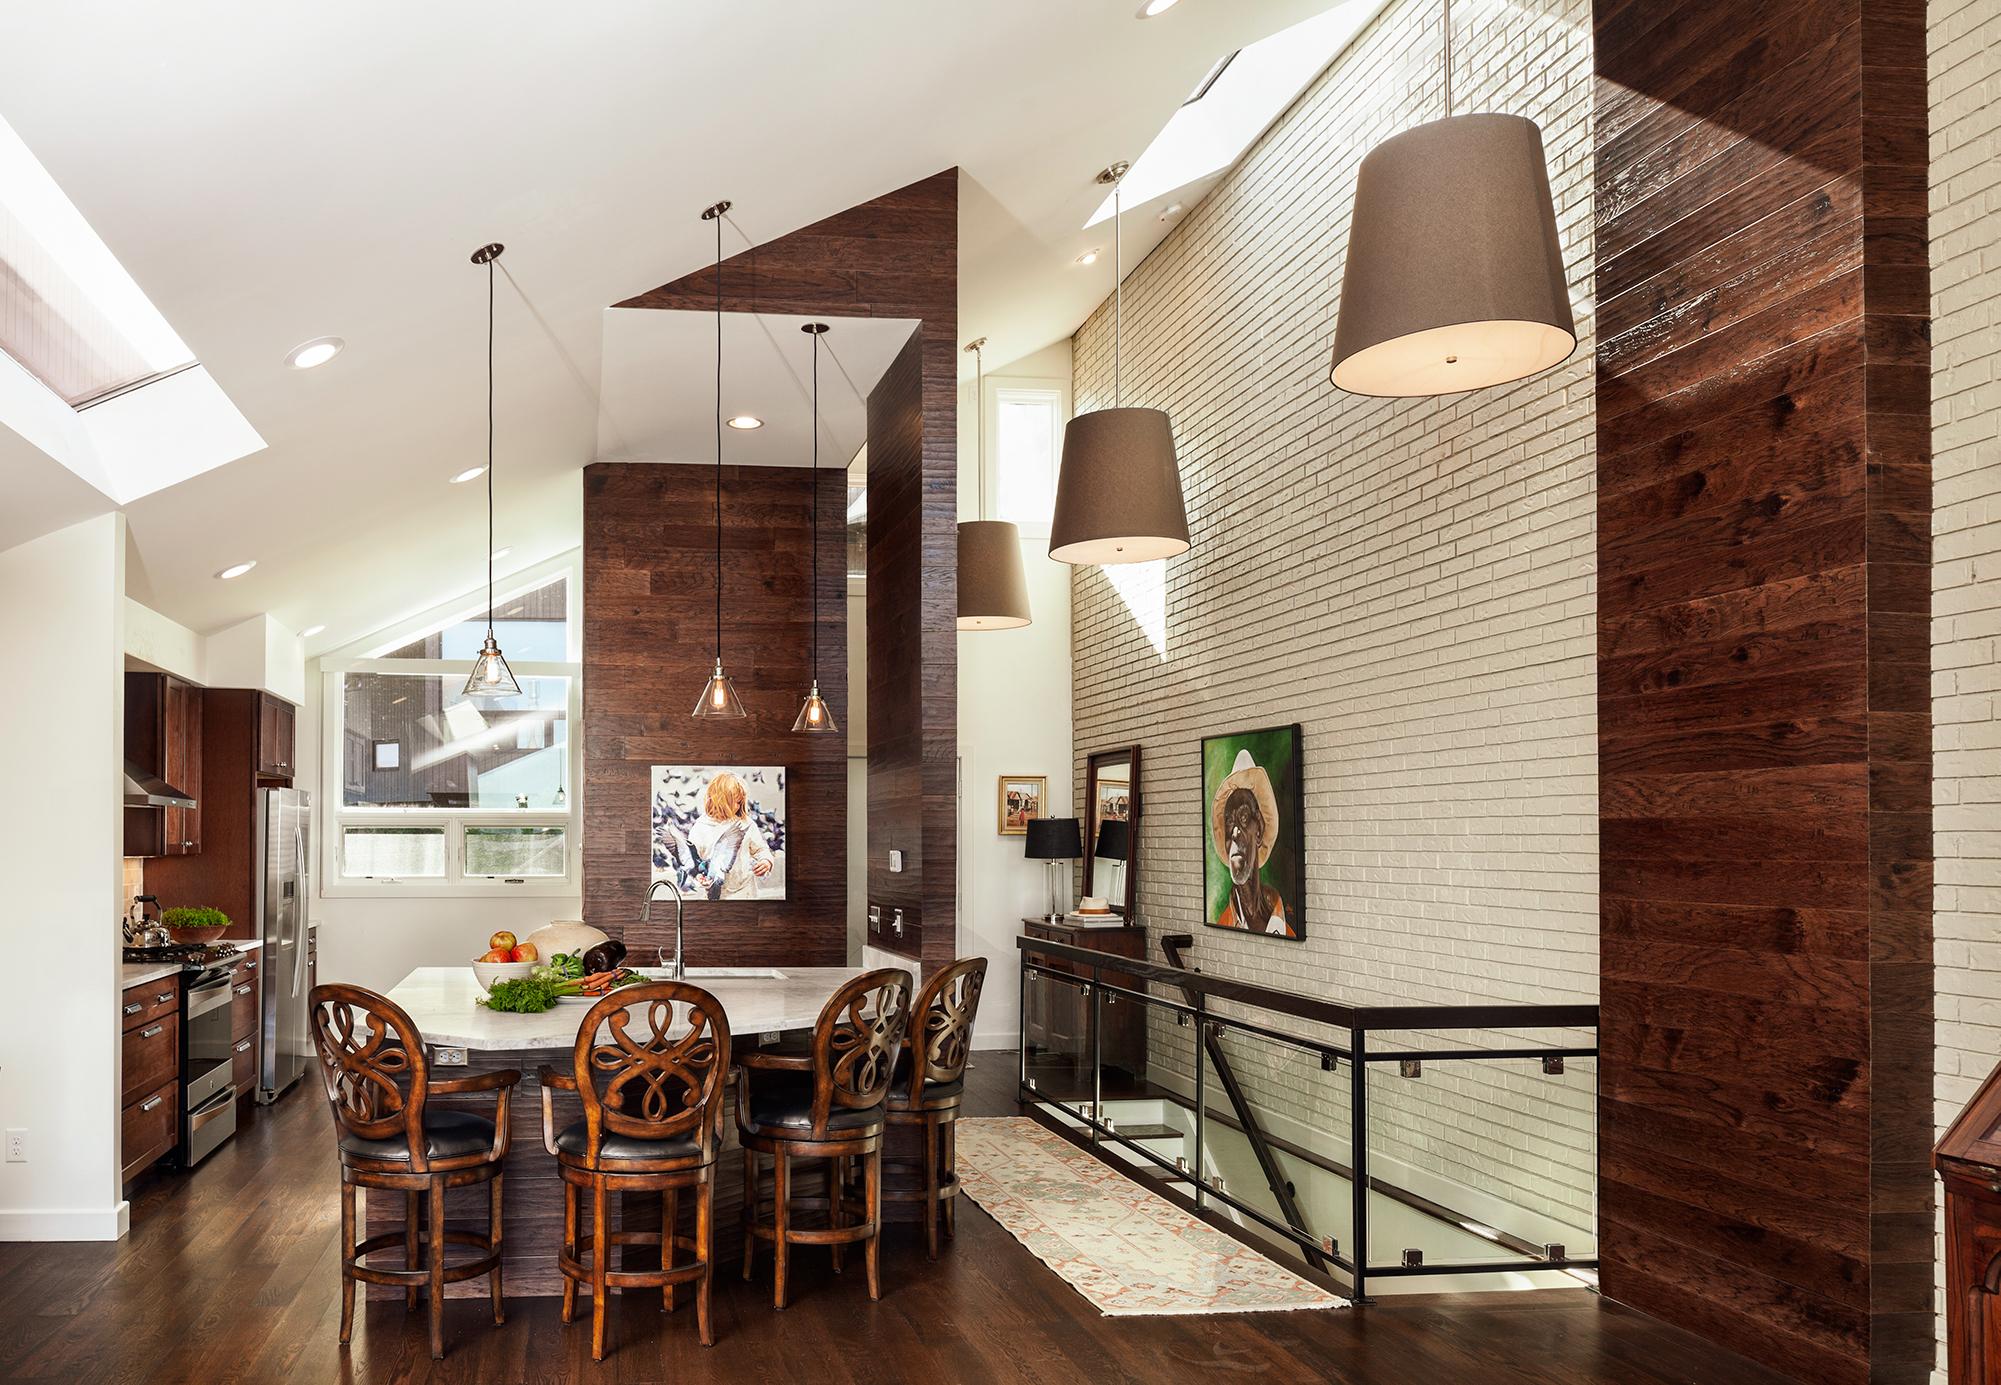 Mt. Adams interior kitchen remodel Wilcox Architecture